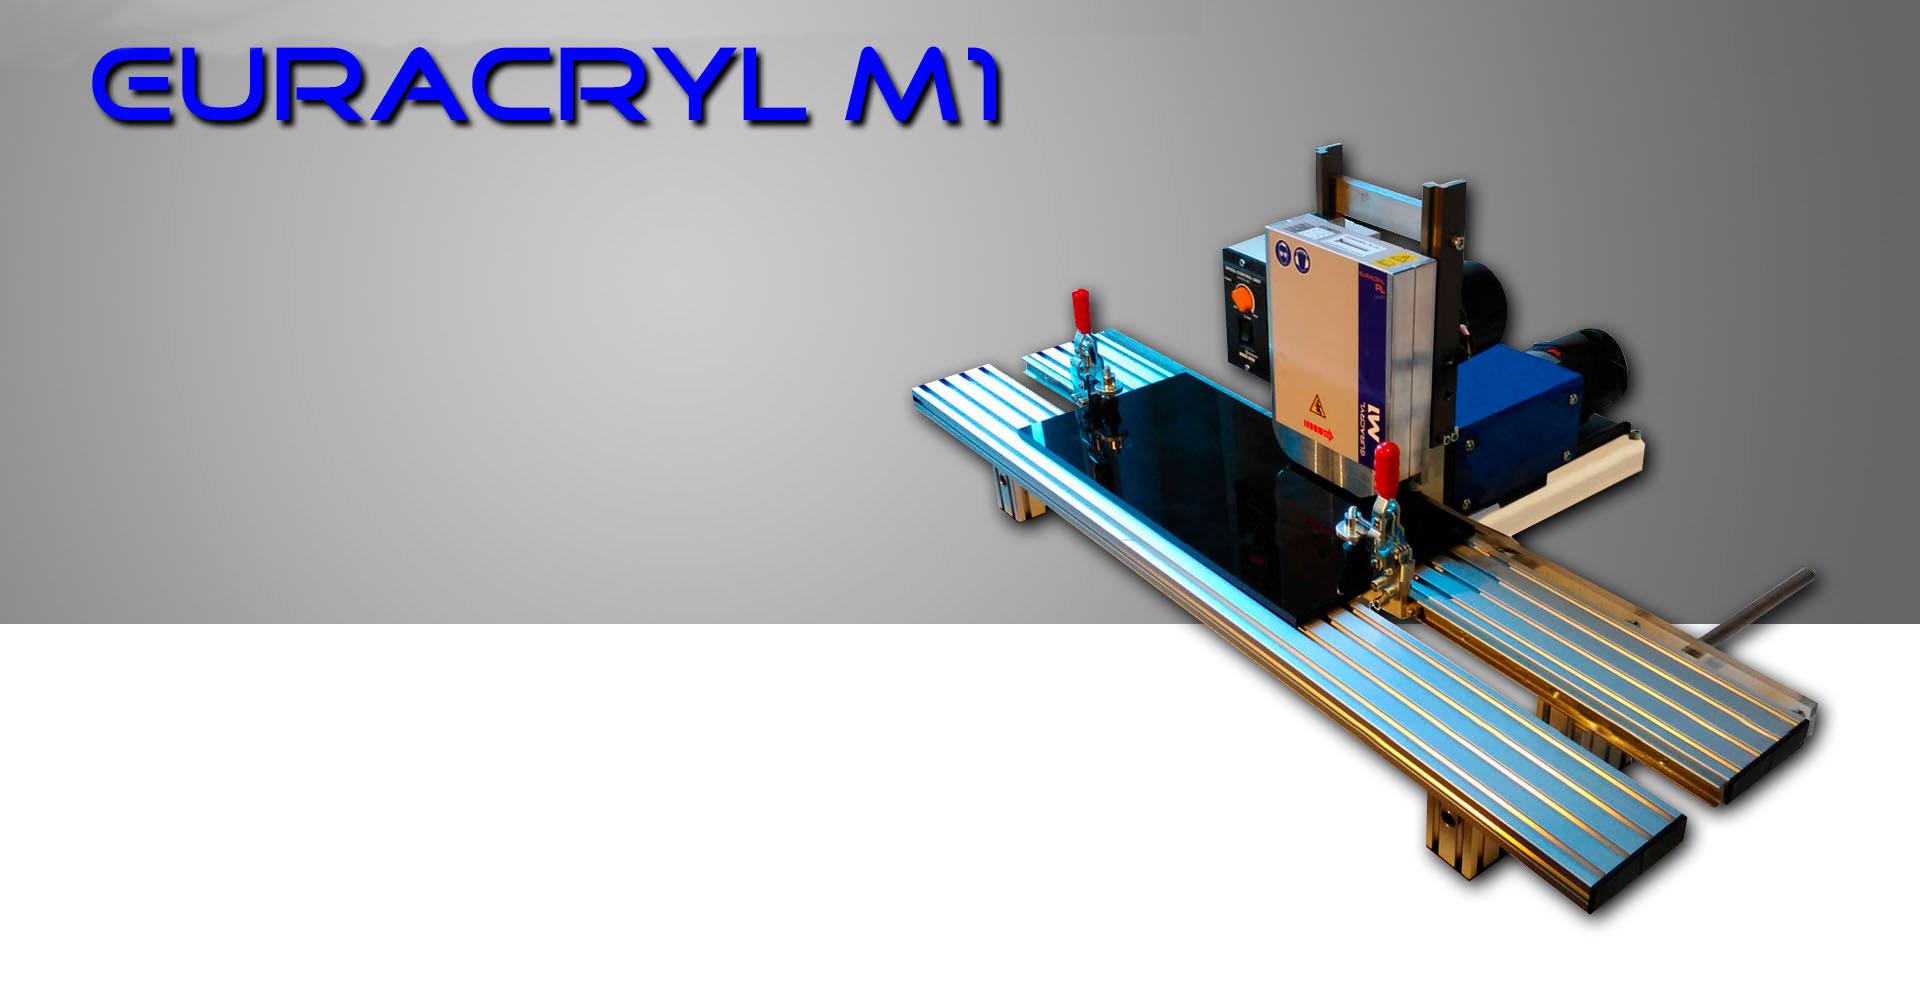 Pulidora de cantos M1 euracryl